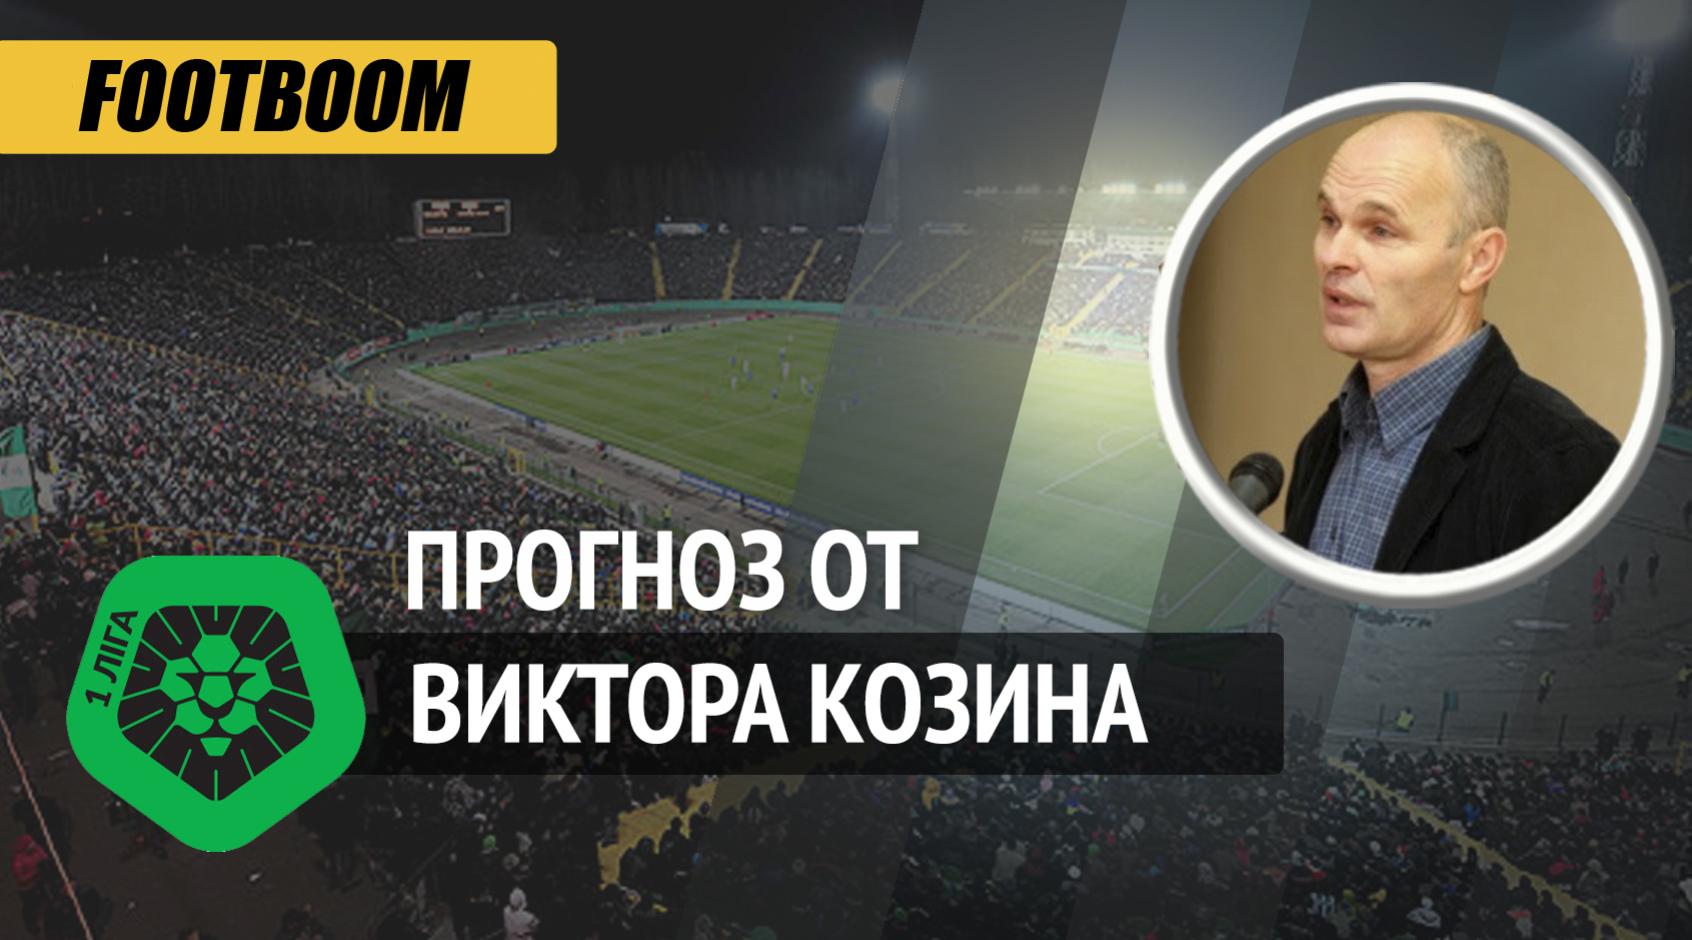 """Металлист 1925"" - ""Горняк-Спорт"": прогноз Виктора Козина"